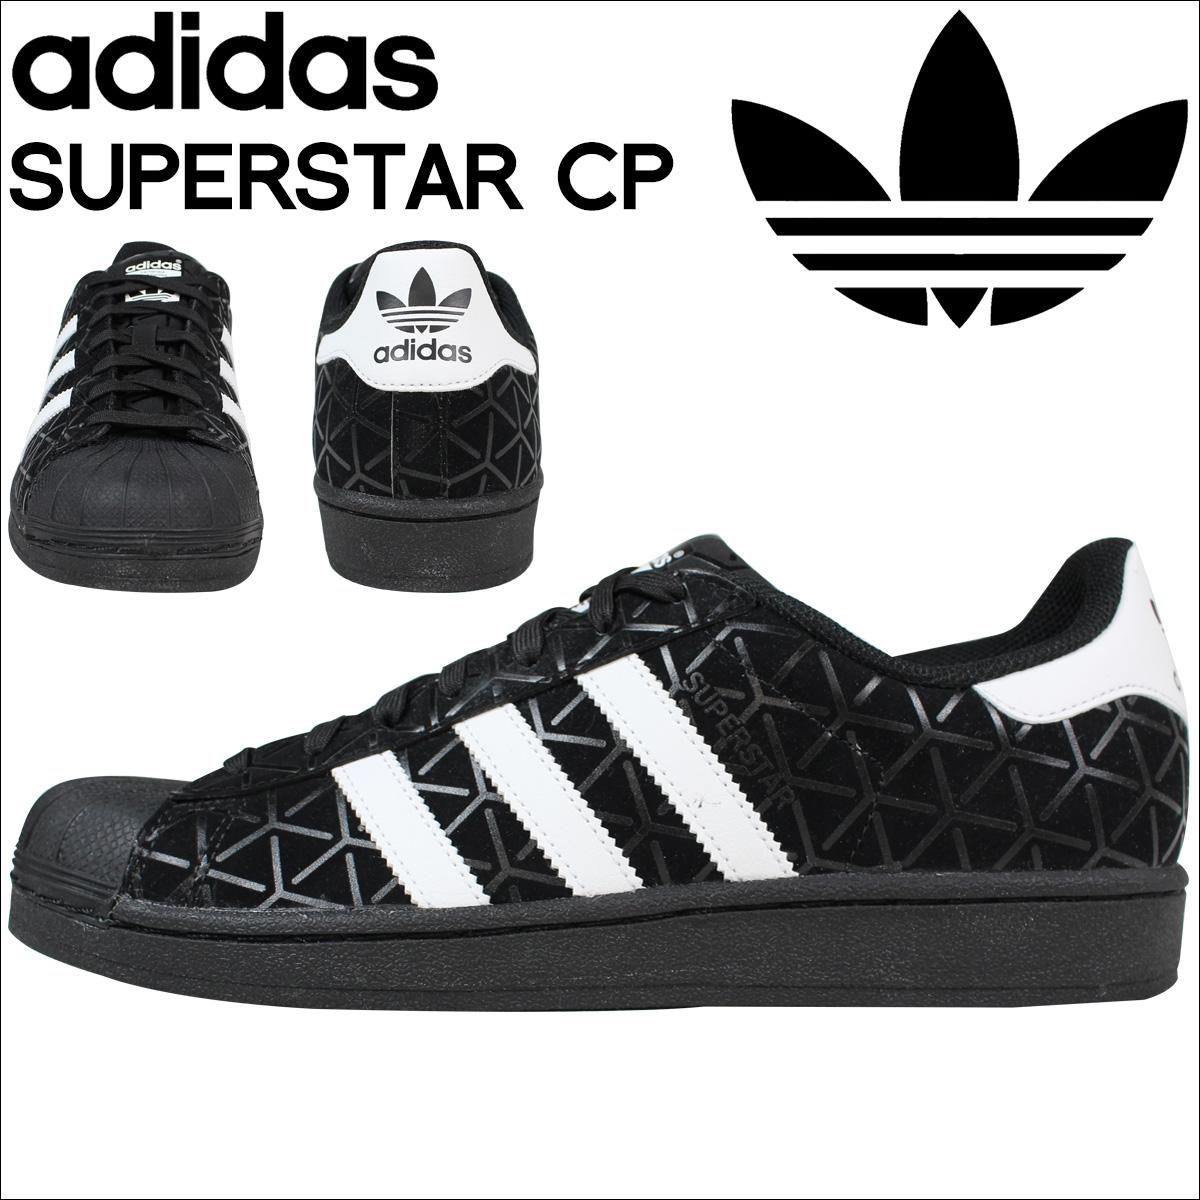 Original Shoesgt; Superstar Off70Discounted Buy Adidas TFJ1lKc